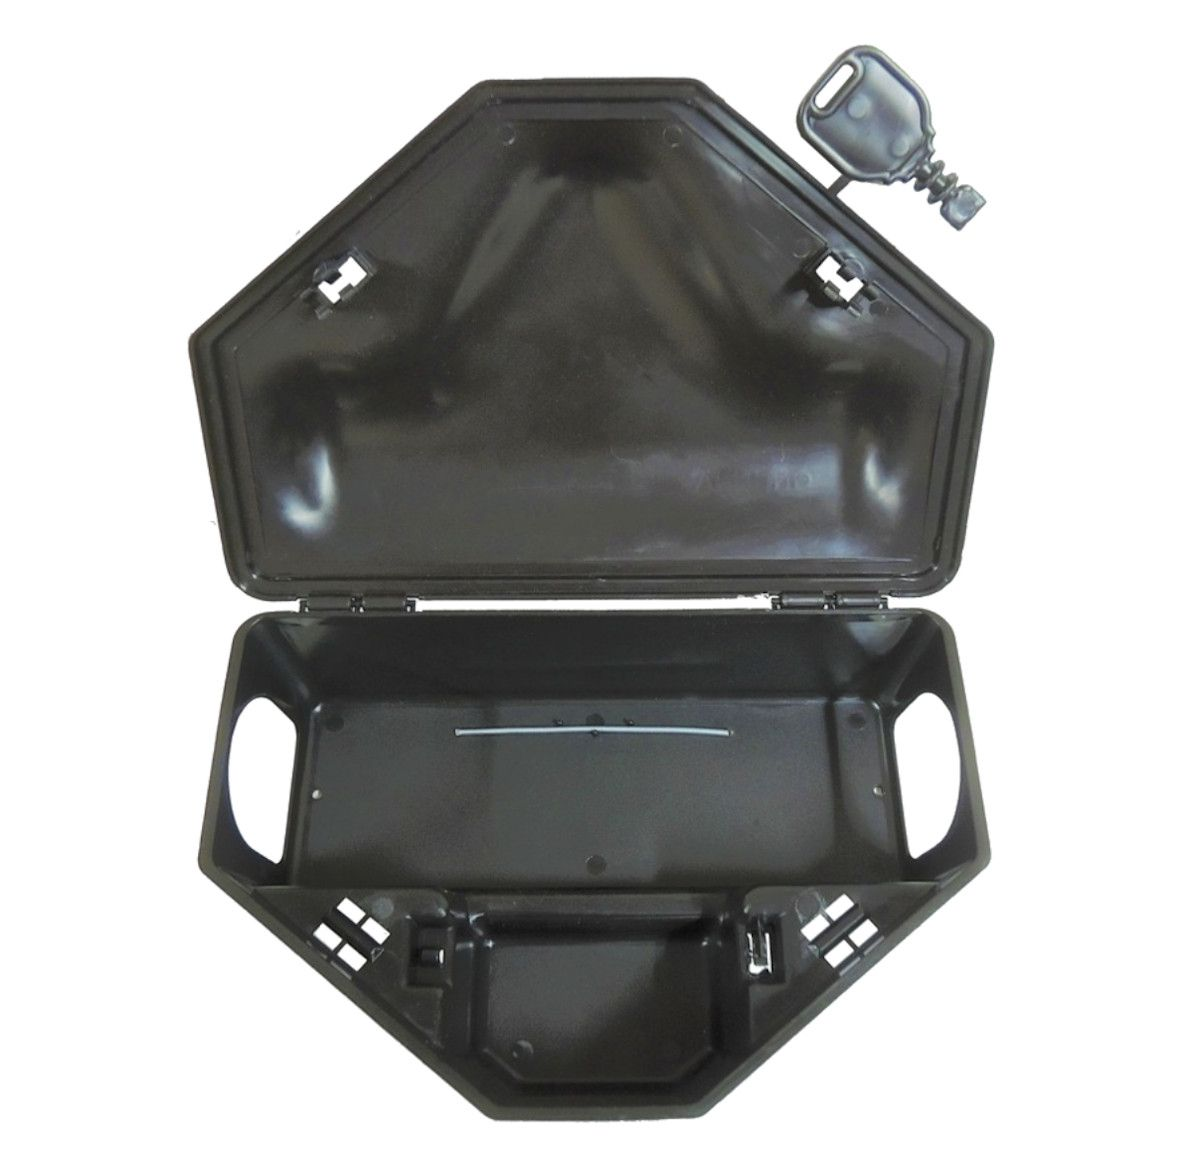 Kit 23 Porta Isca Com 2 Chaves - Duplo Travamento